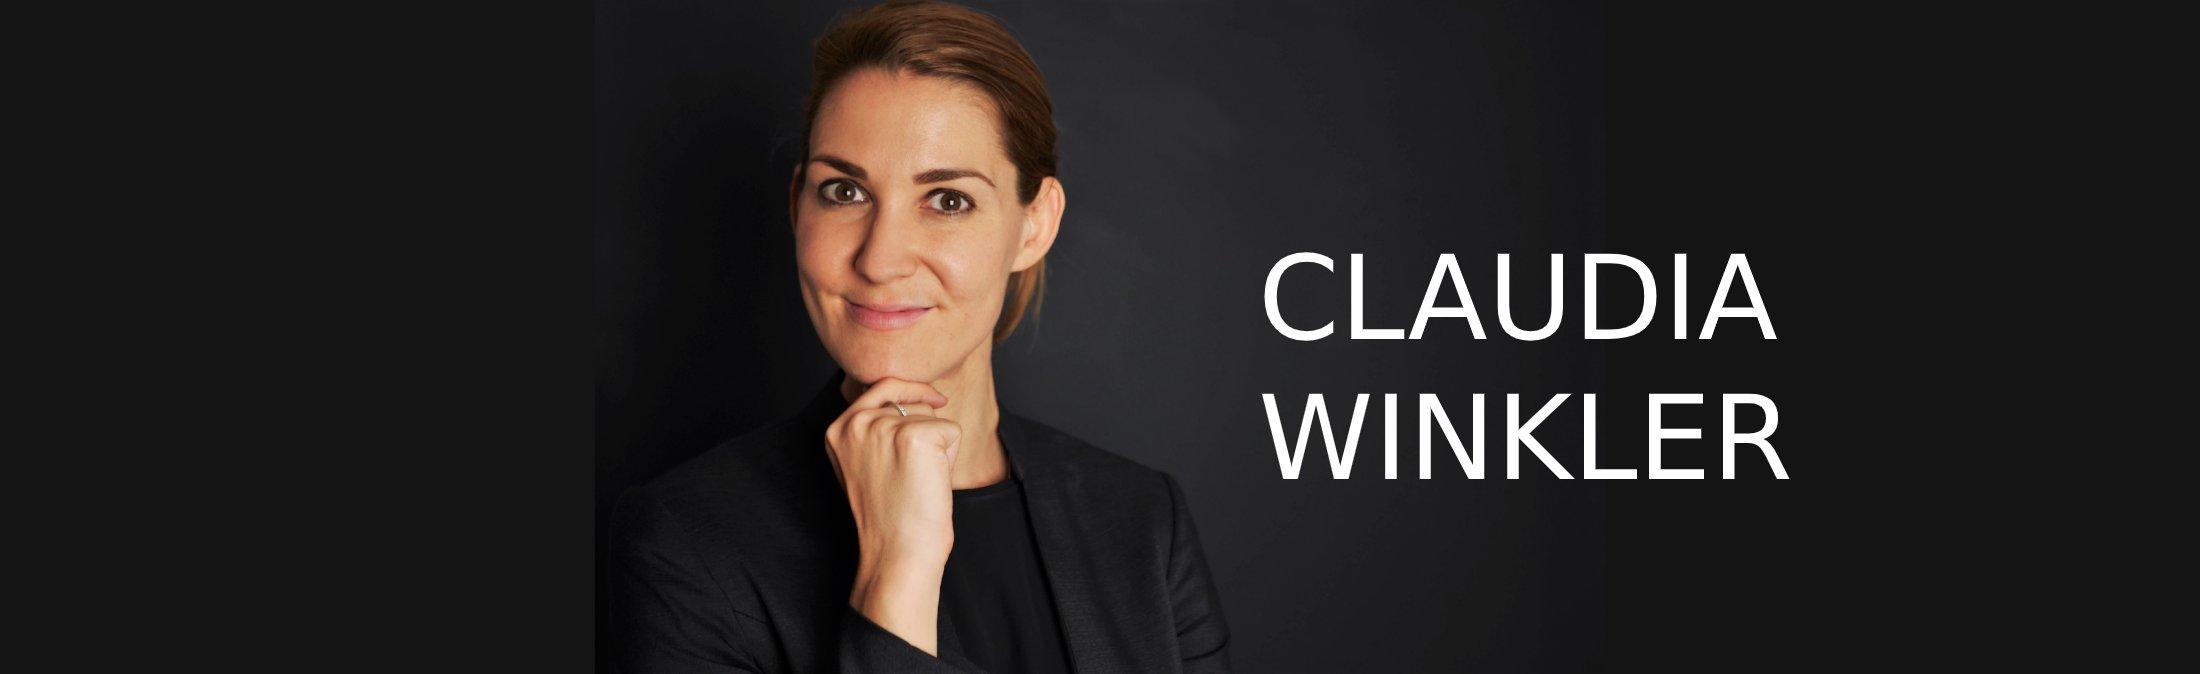 Claudia Winkler — founder